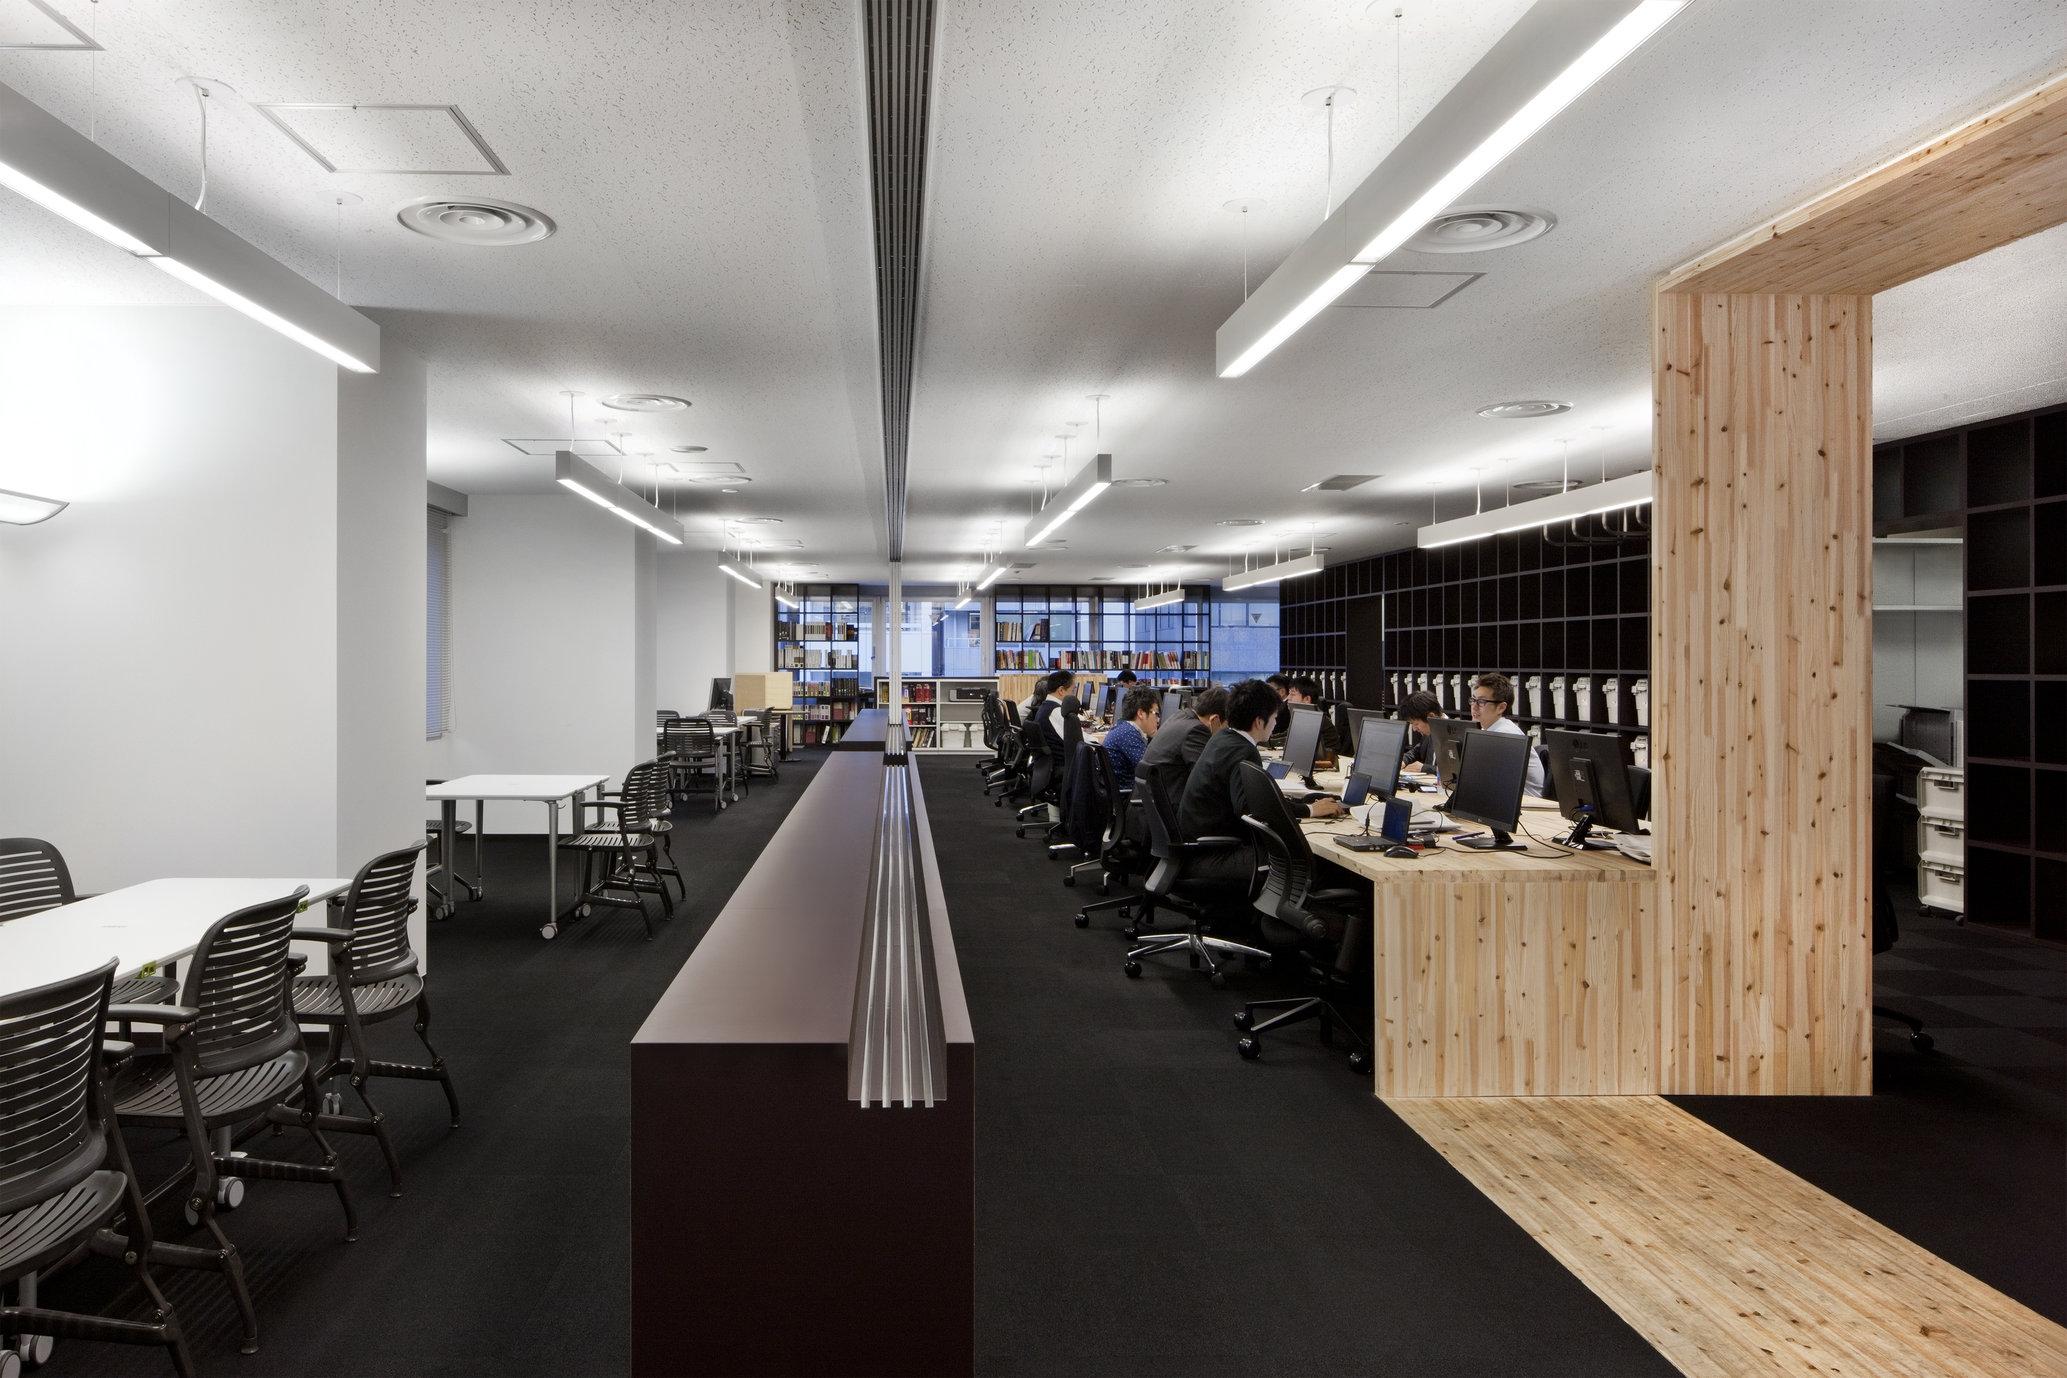 Office Design Company Midas Company Ltd Opens Newly